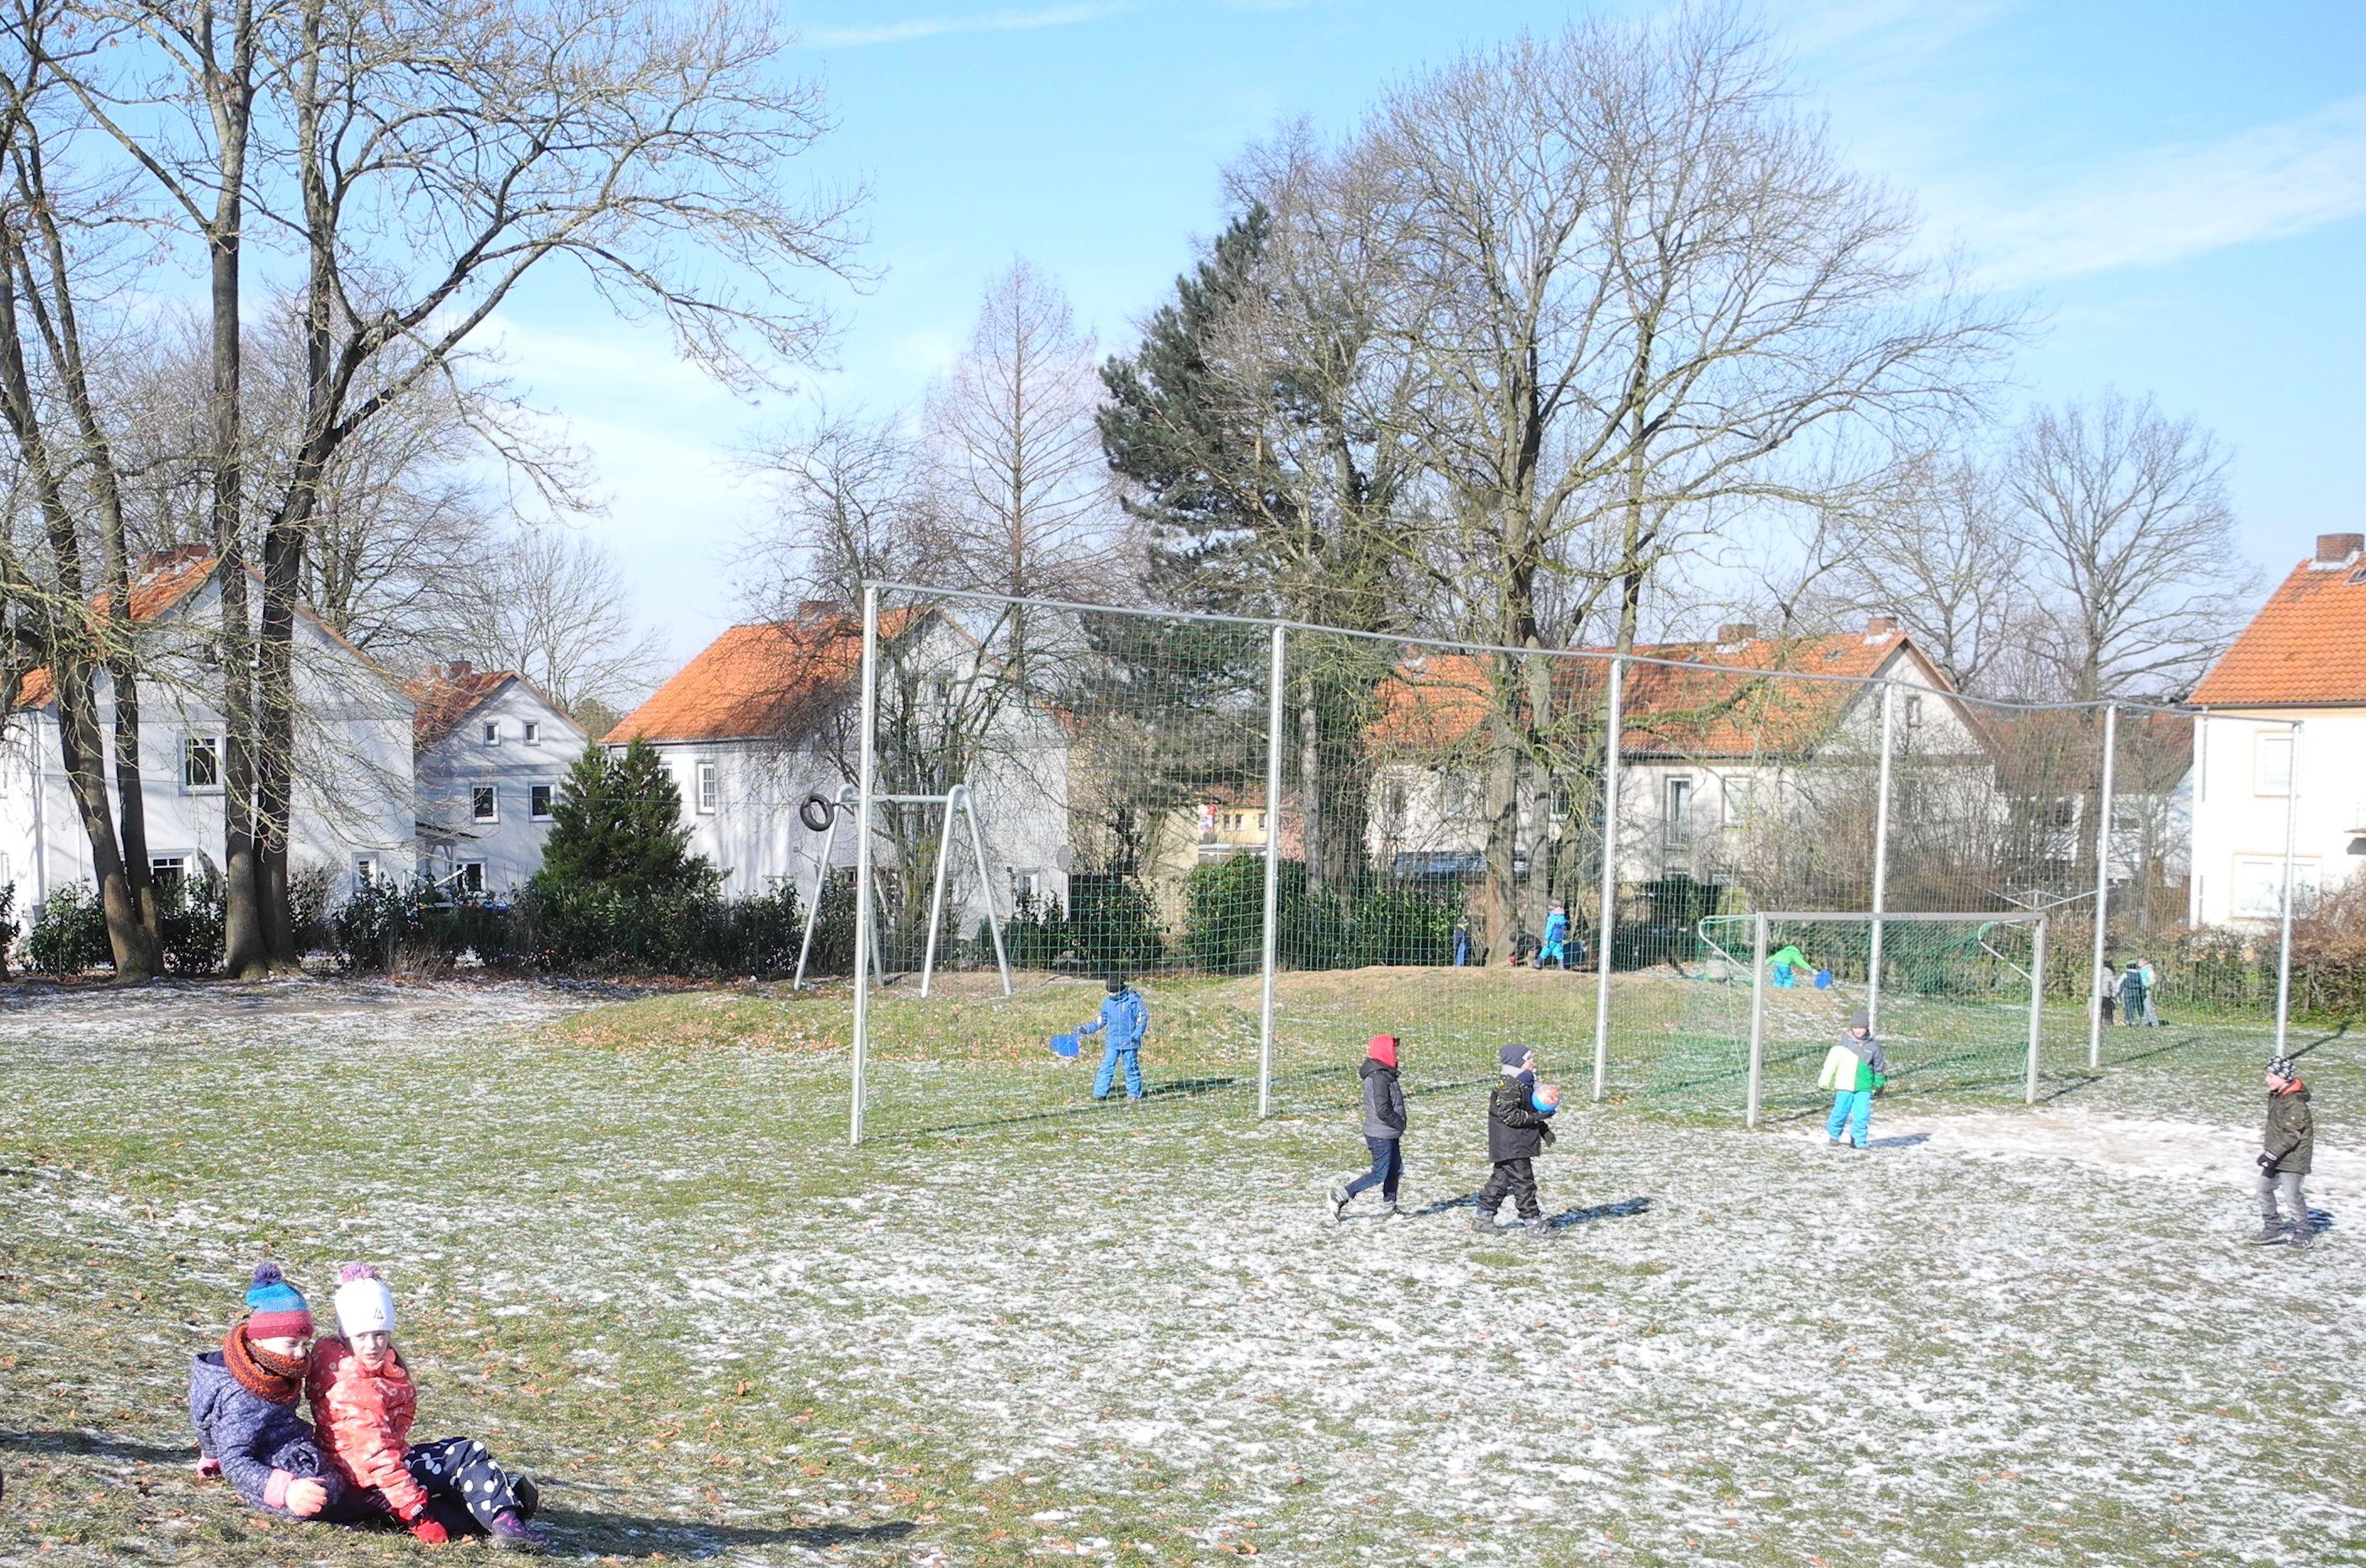 immanuel, Immanuel Schule, Bückeburg